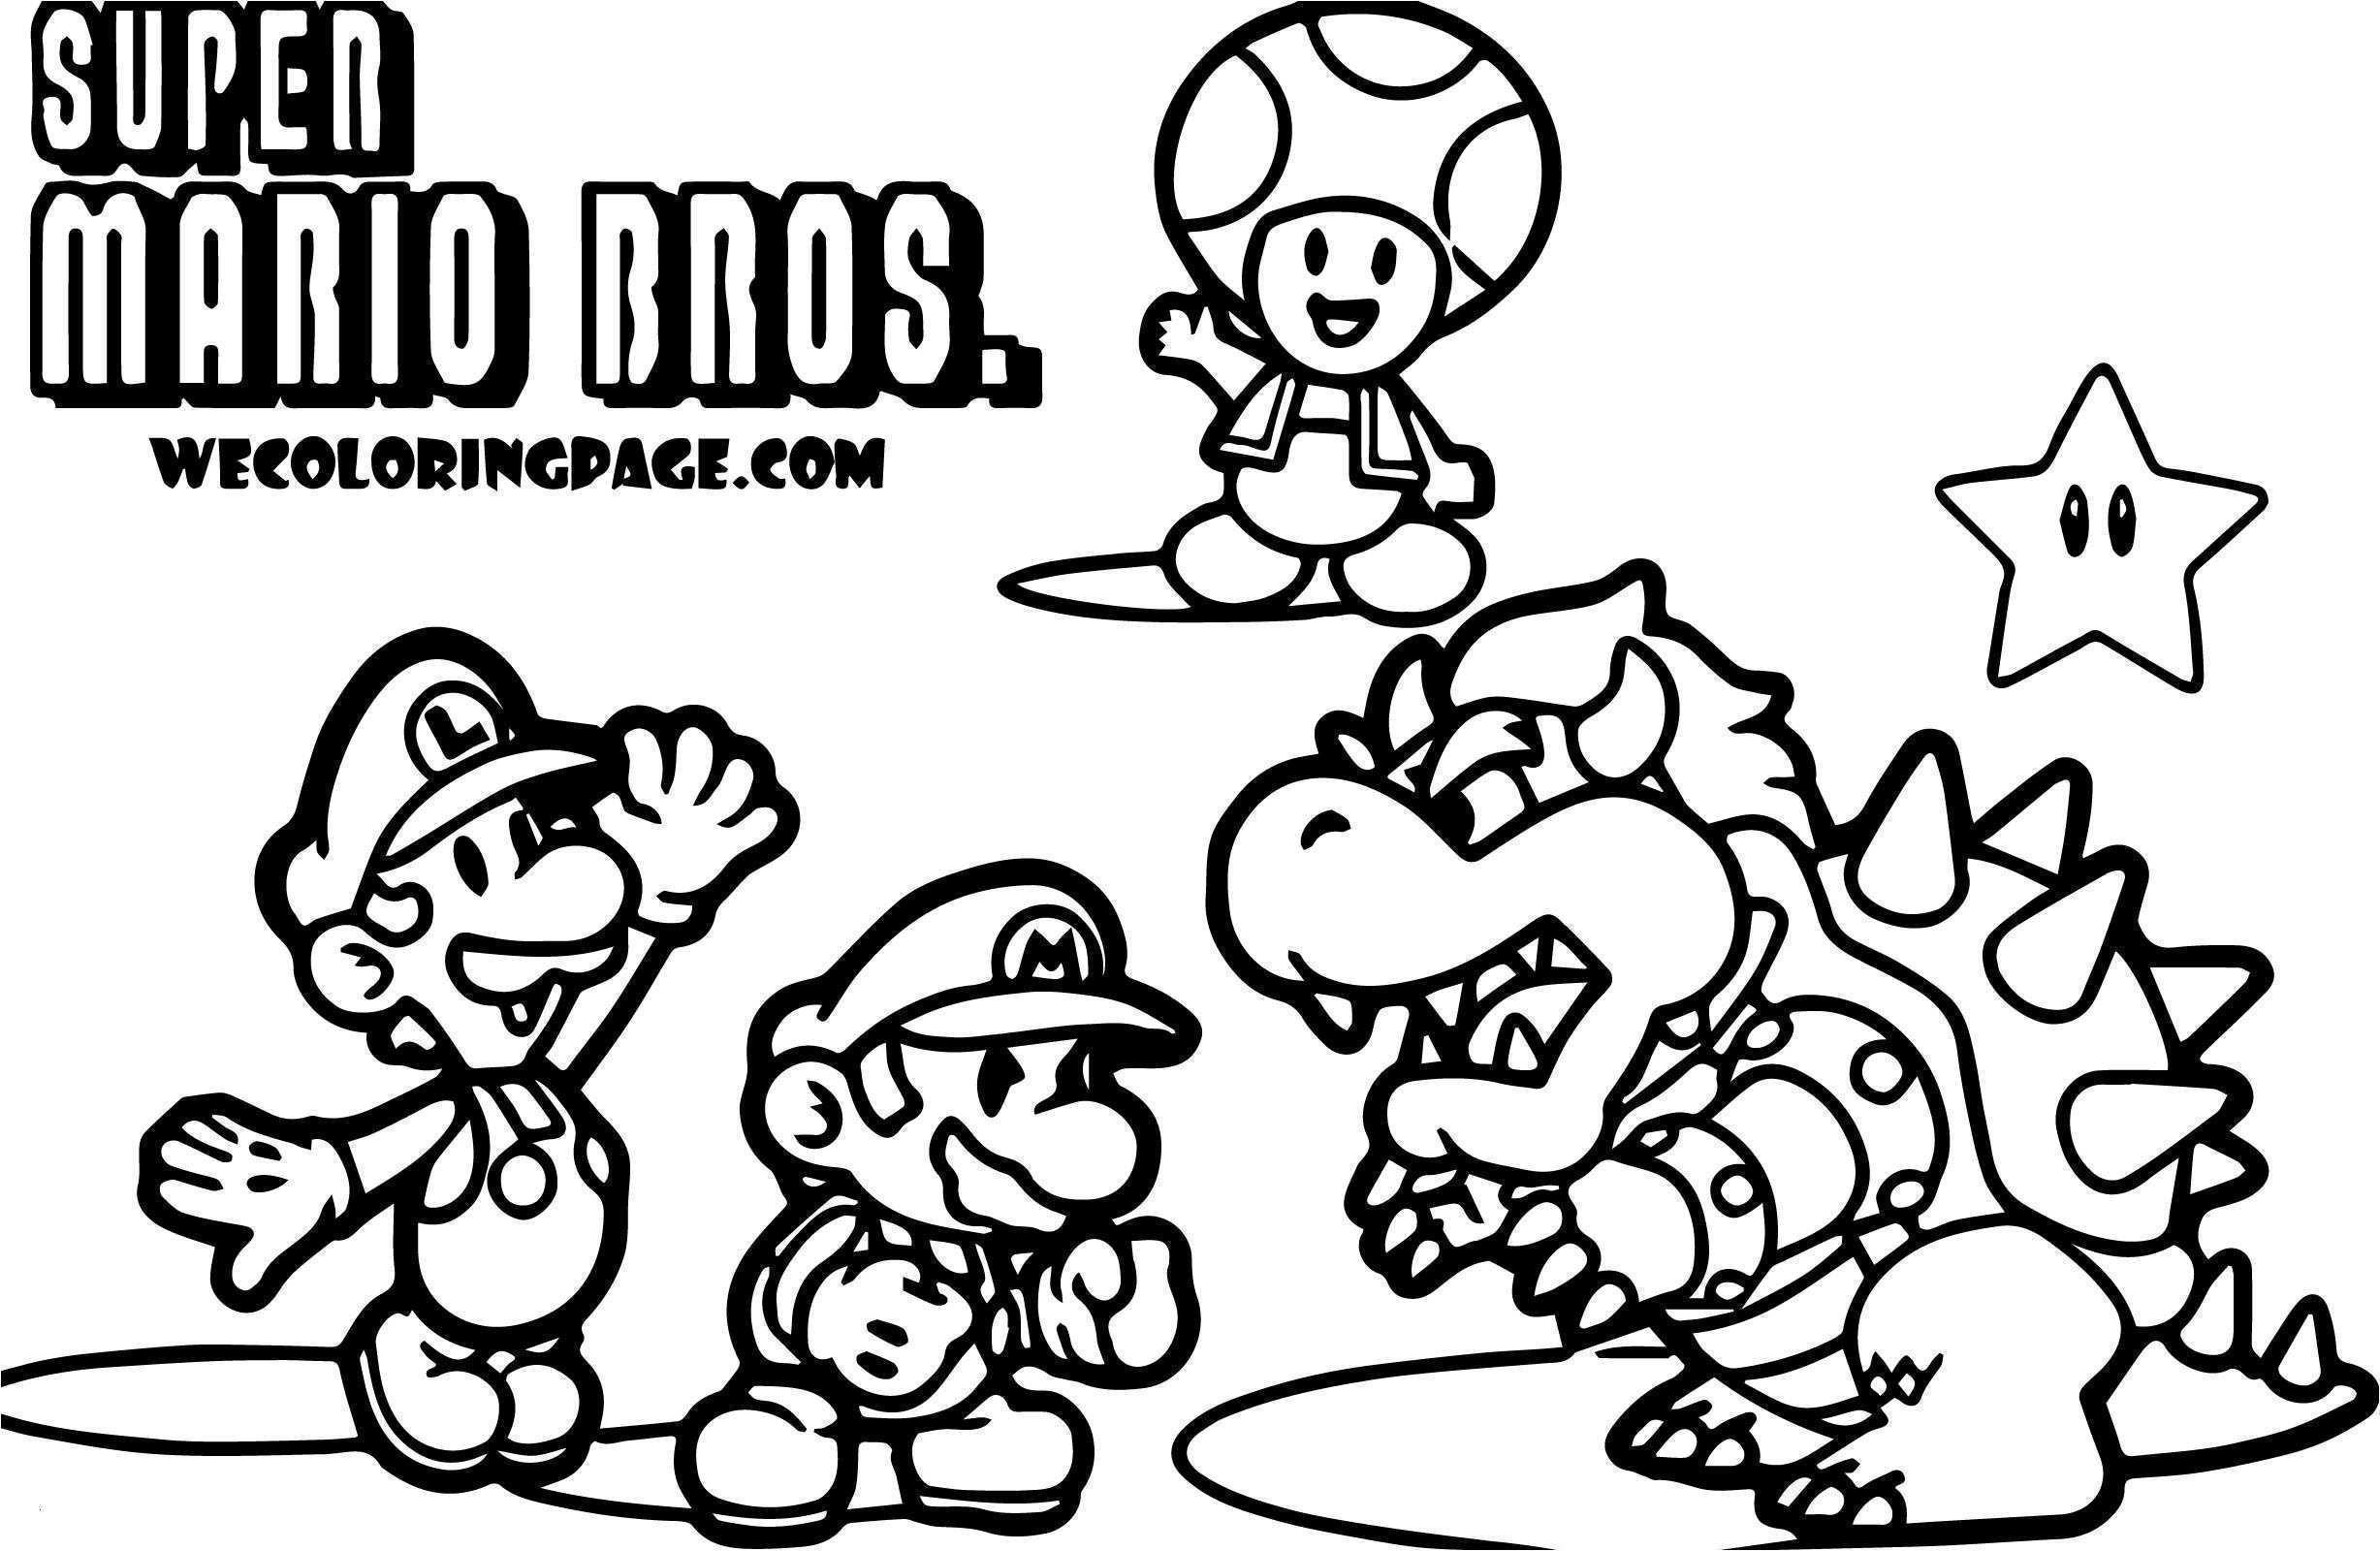 Ausmalbilder Super Mario 3d World Genial Coloriage Mario Kart Luigi Ideas 35 Ausmalbilder Super Mario 3d Galerie